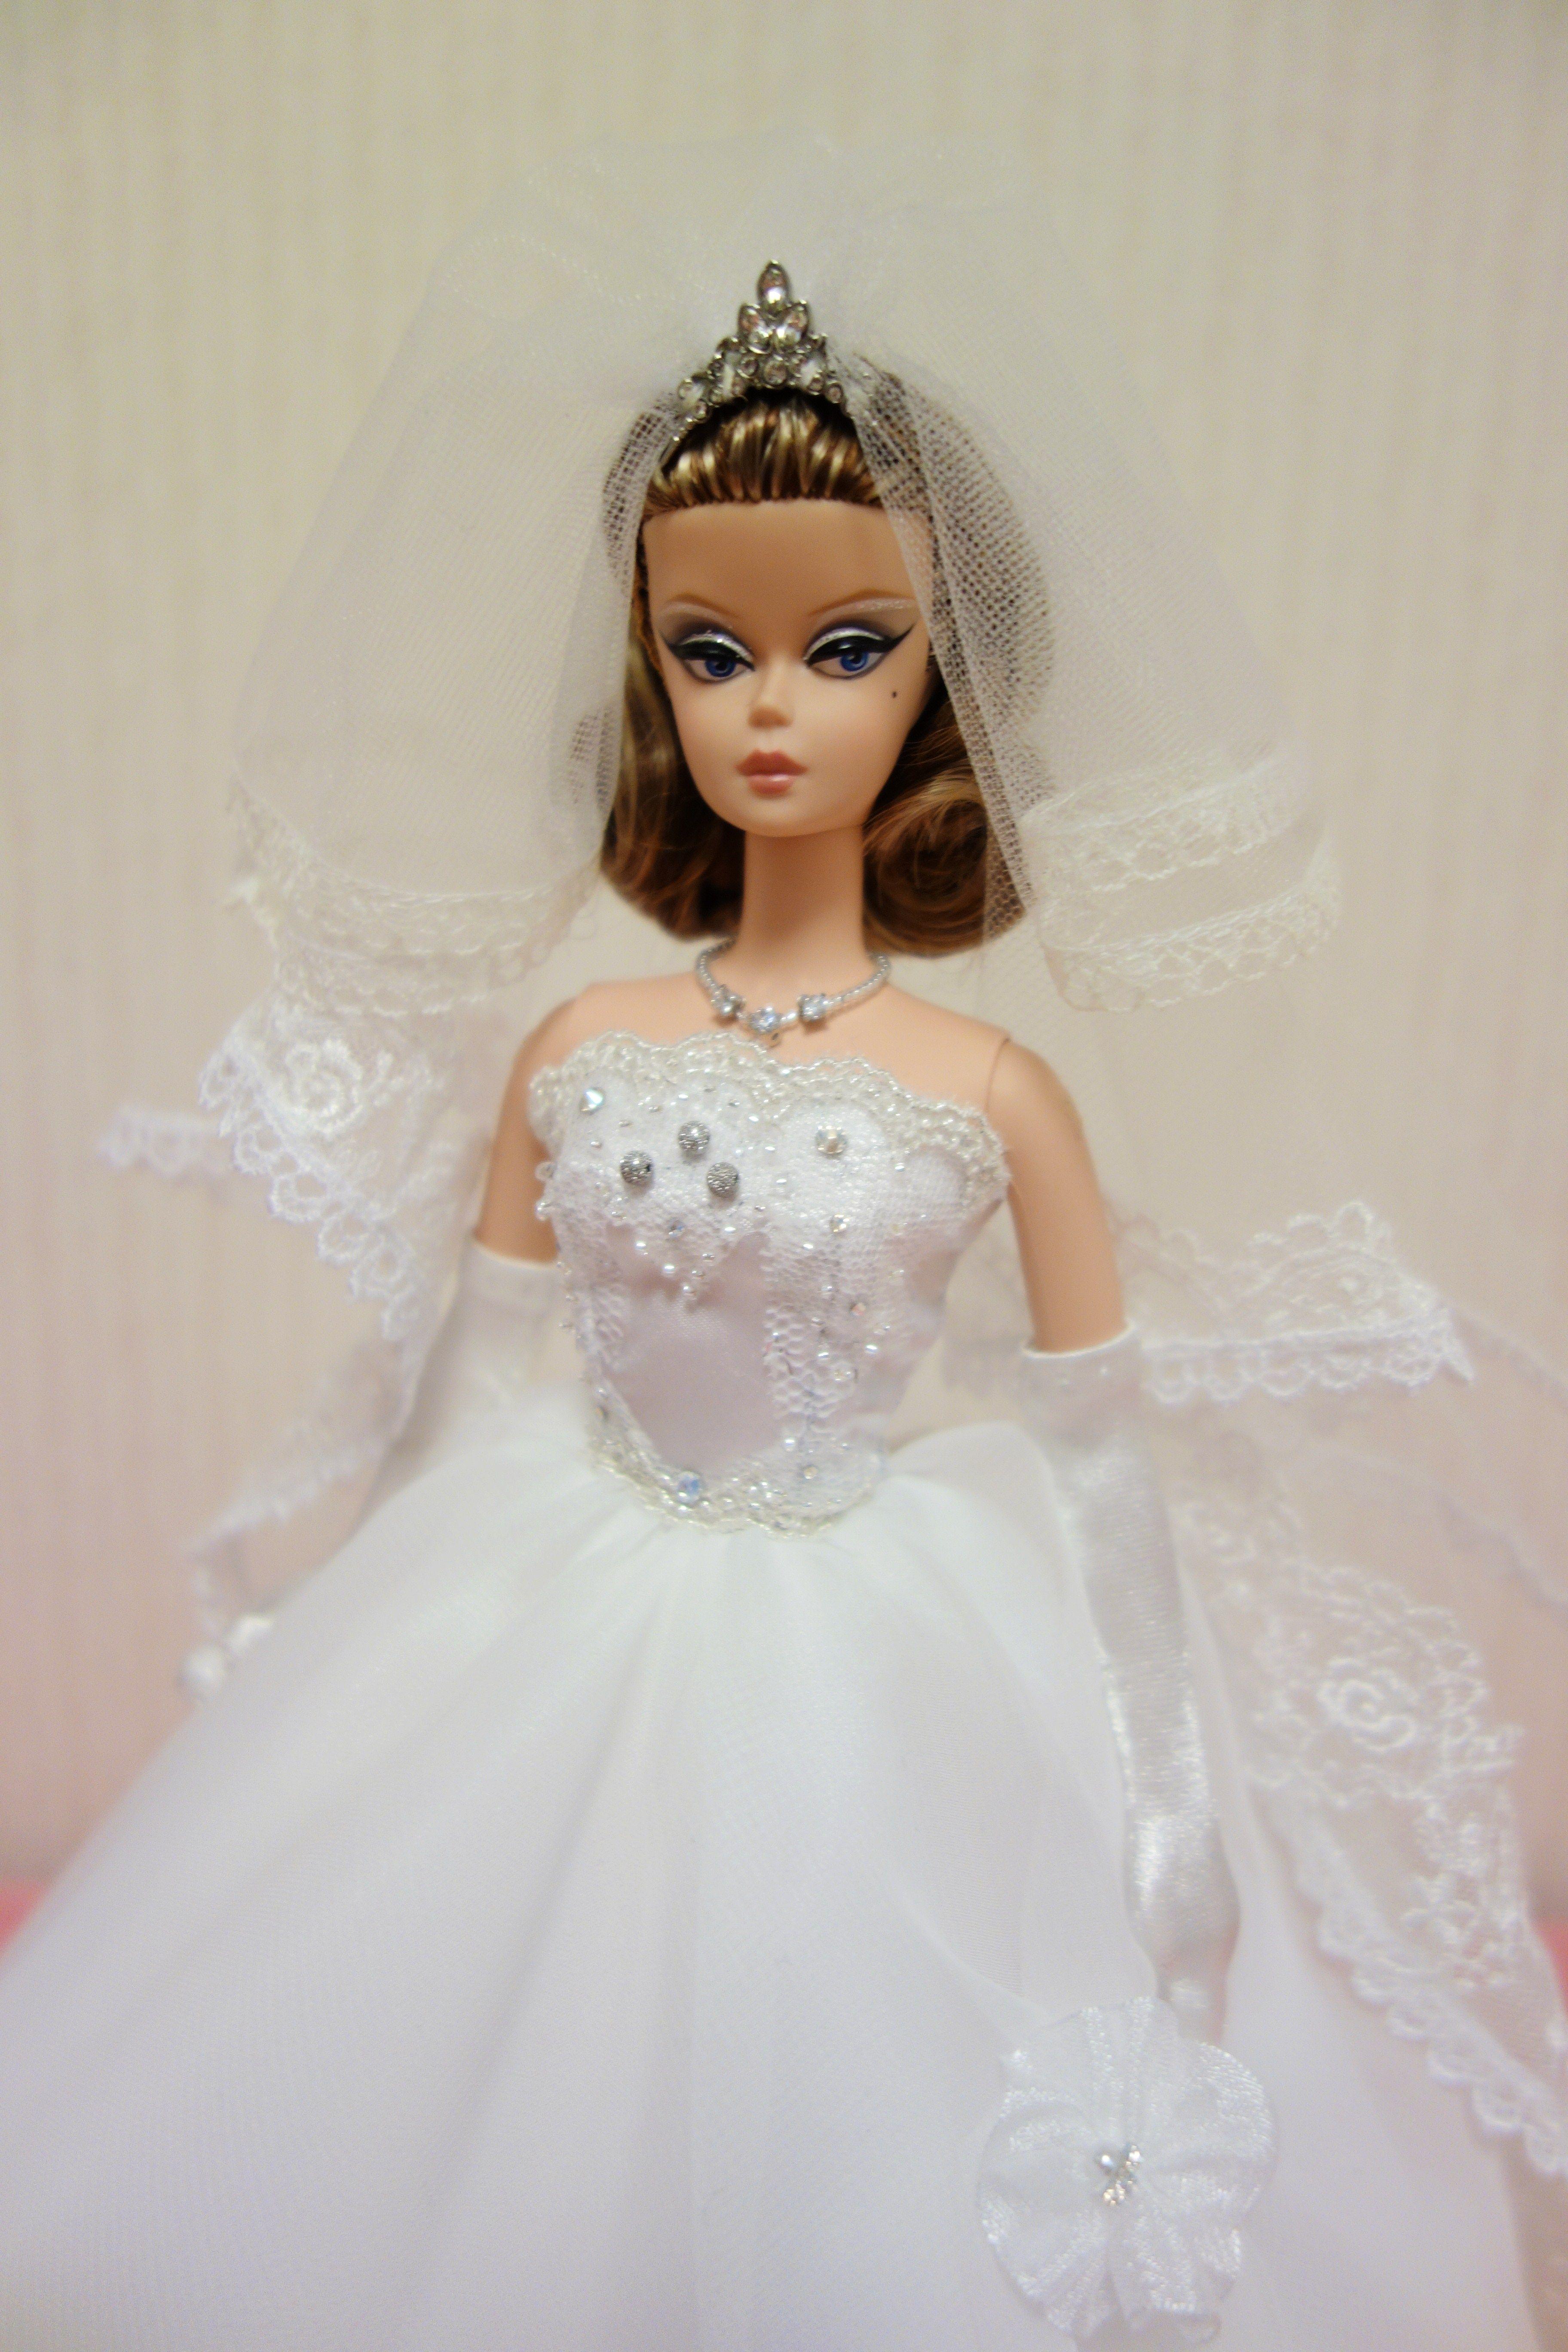 White cocktail dress for wedding  Pin by Jill Fracci on Bridal Dolls u their trousseau  Pinterest